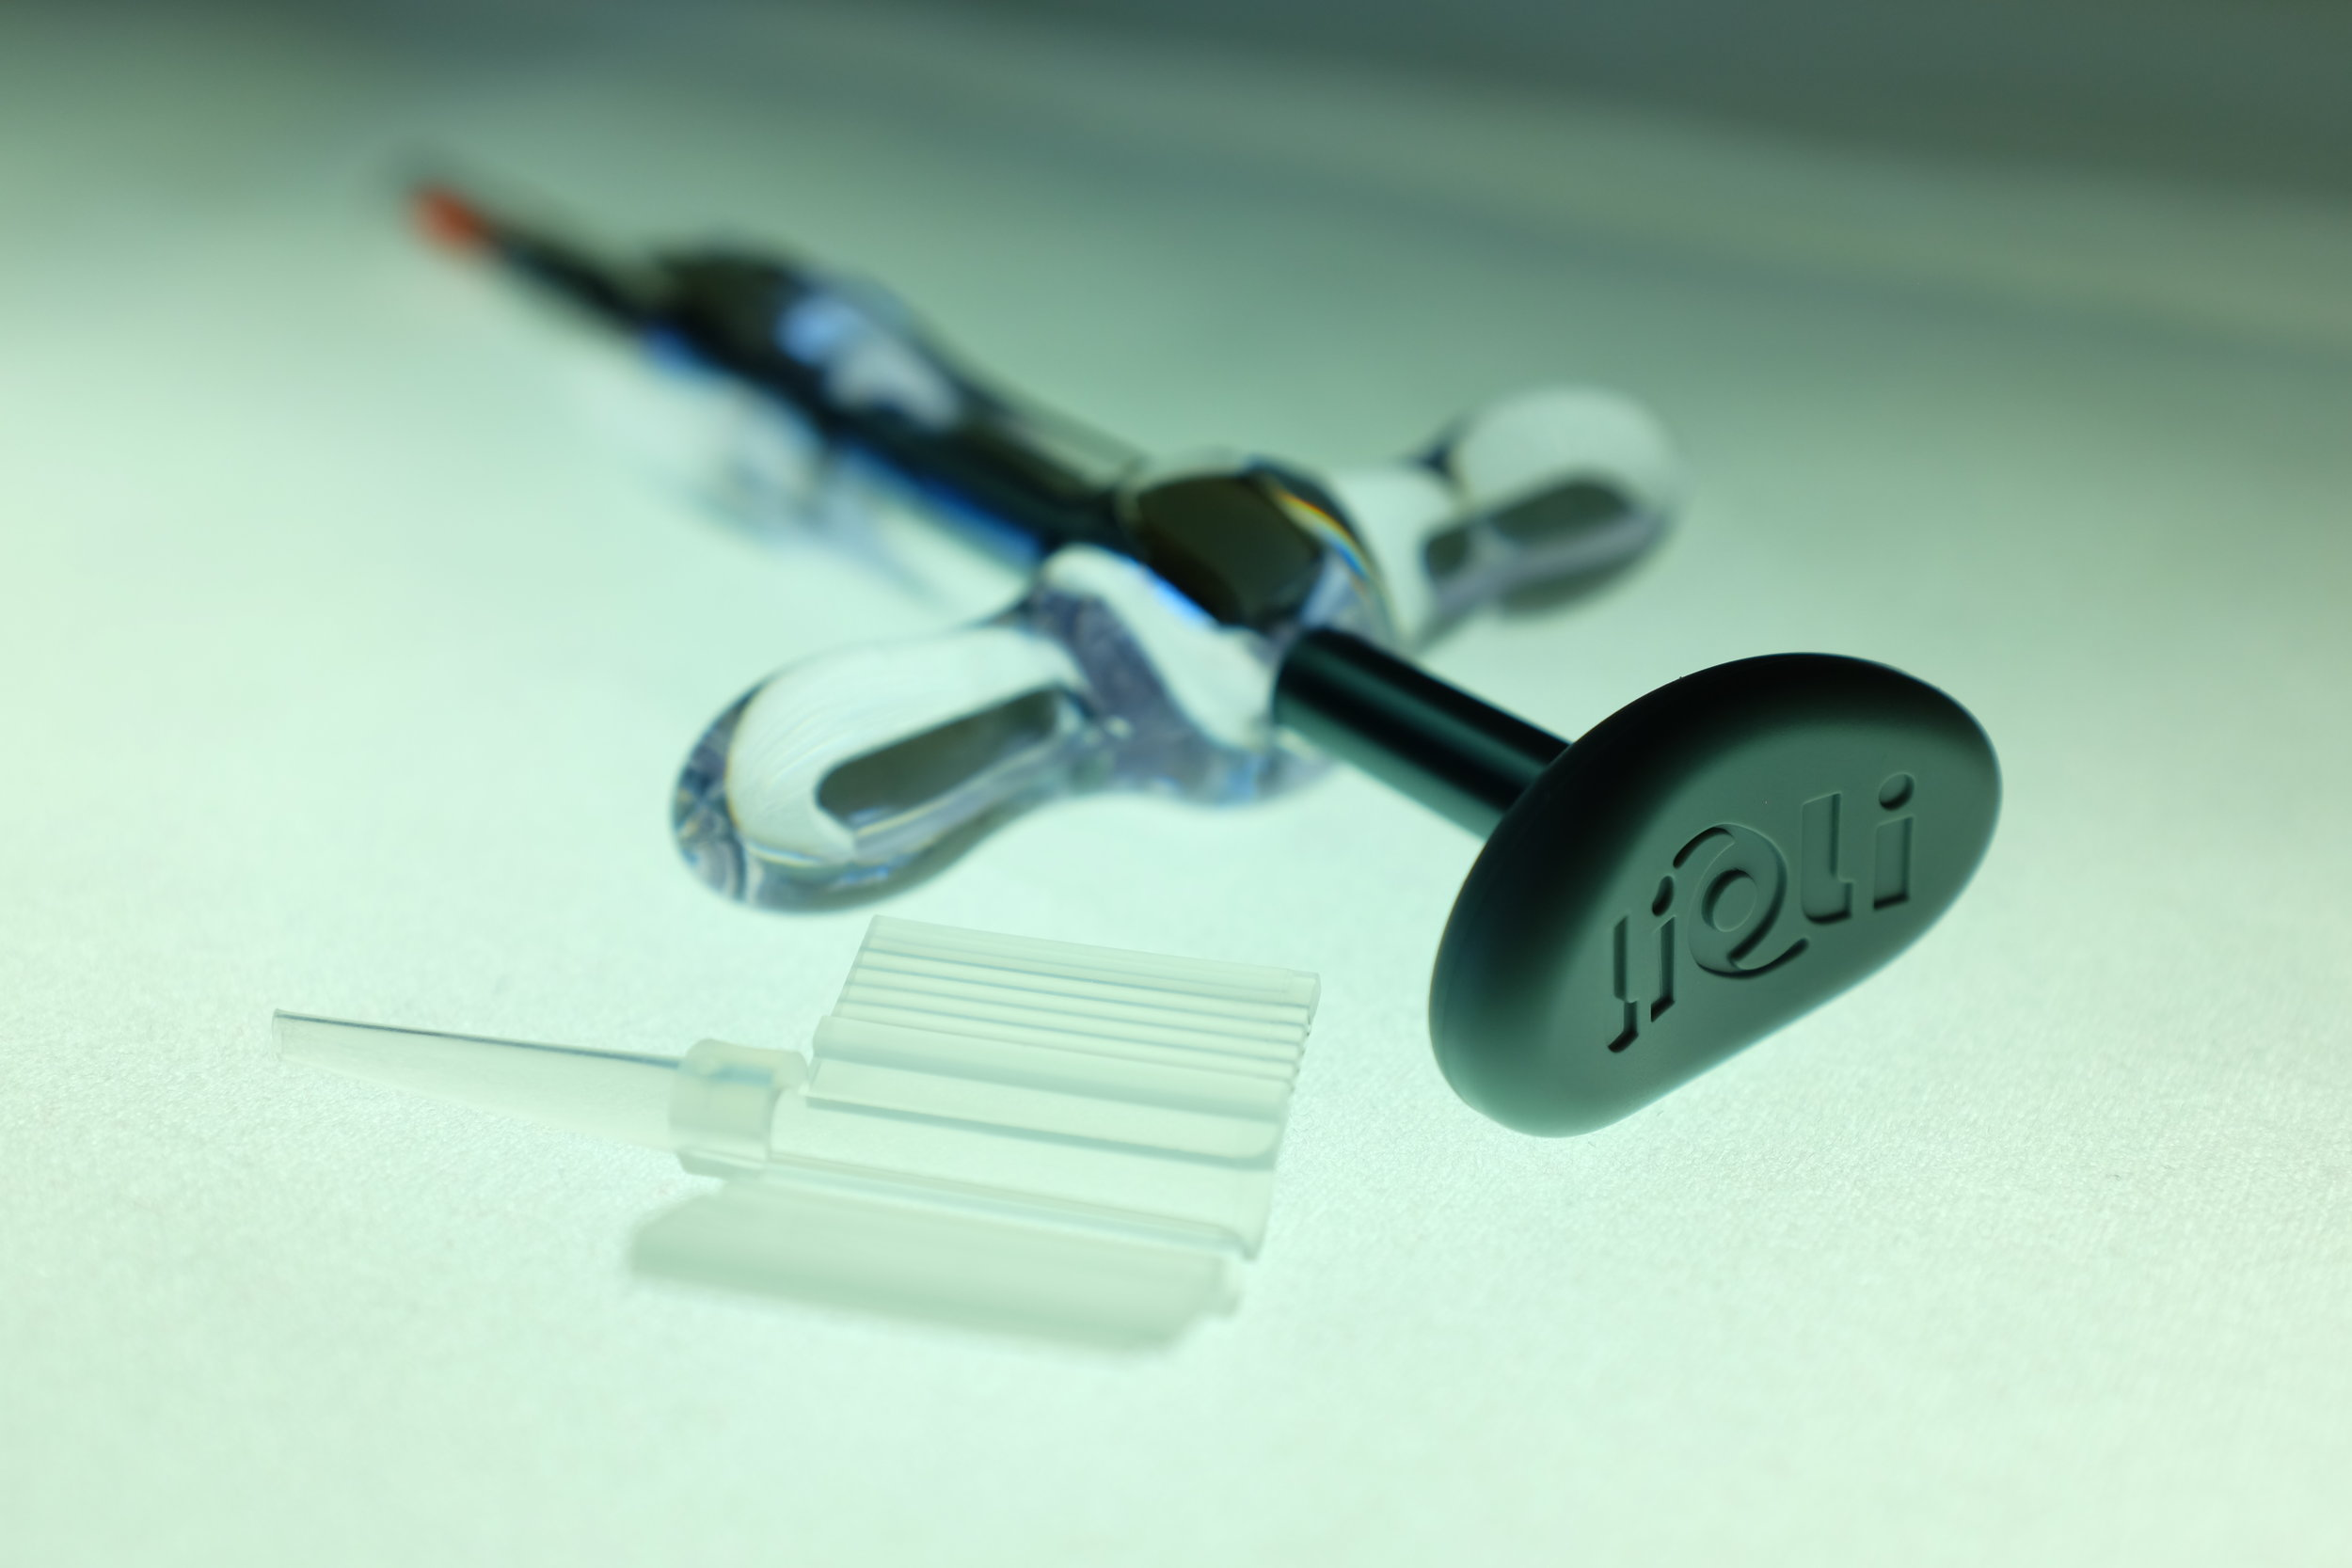 lioli with cartridge.jpg